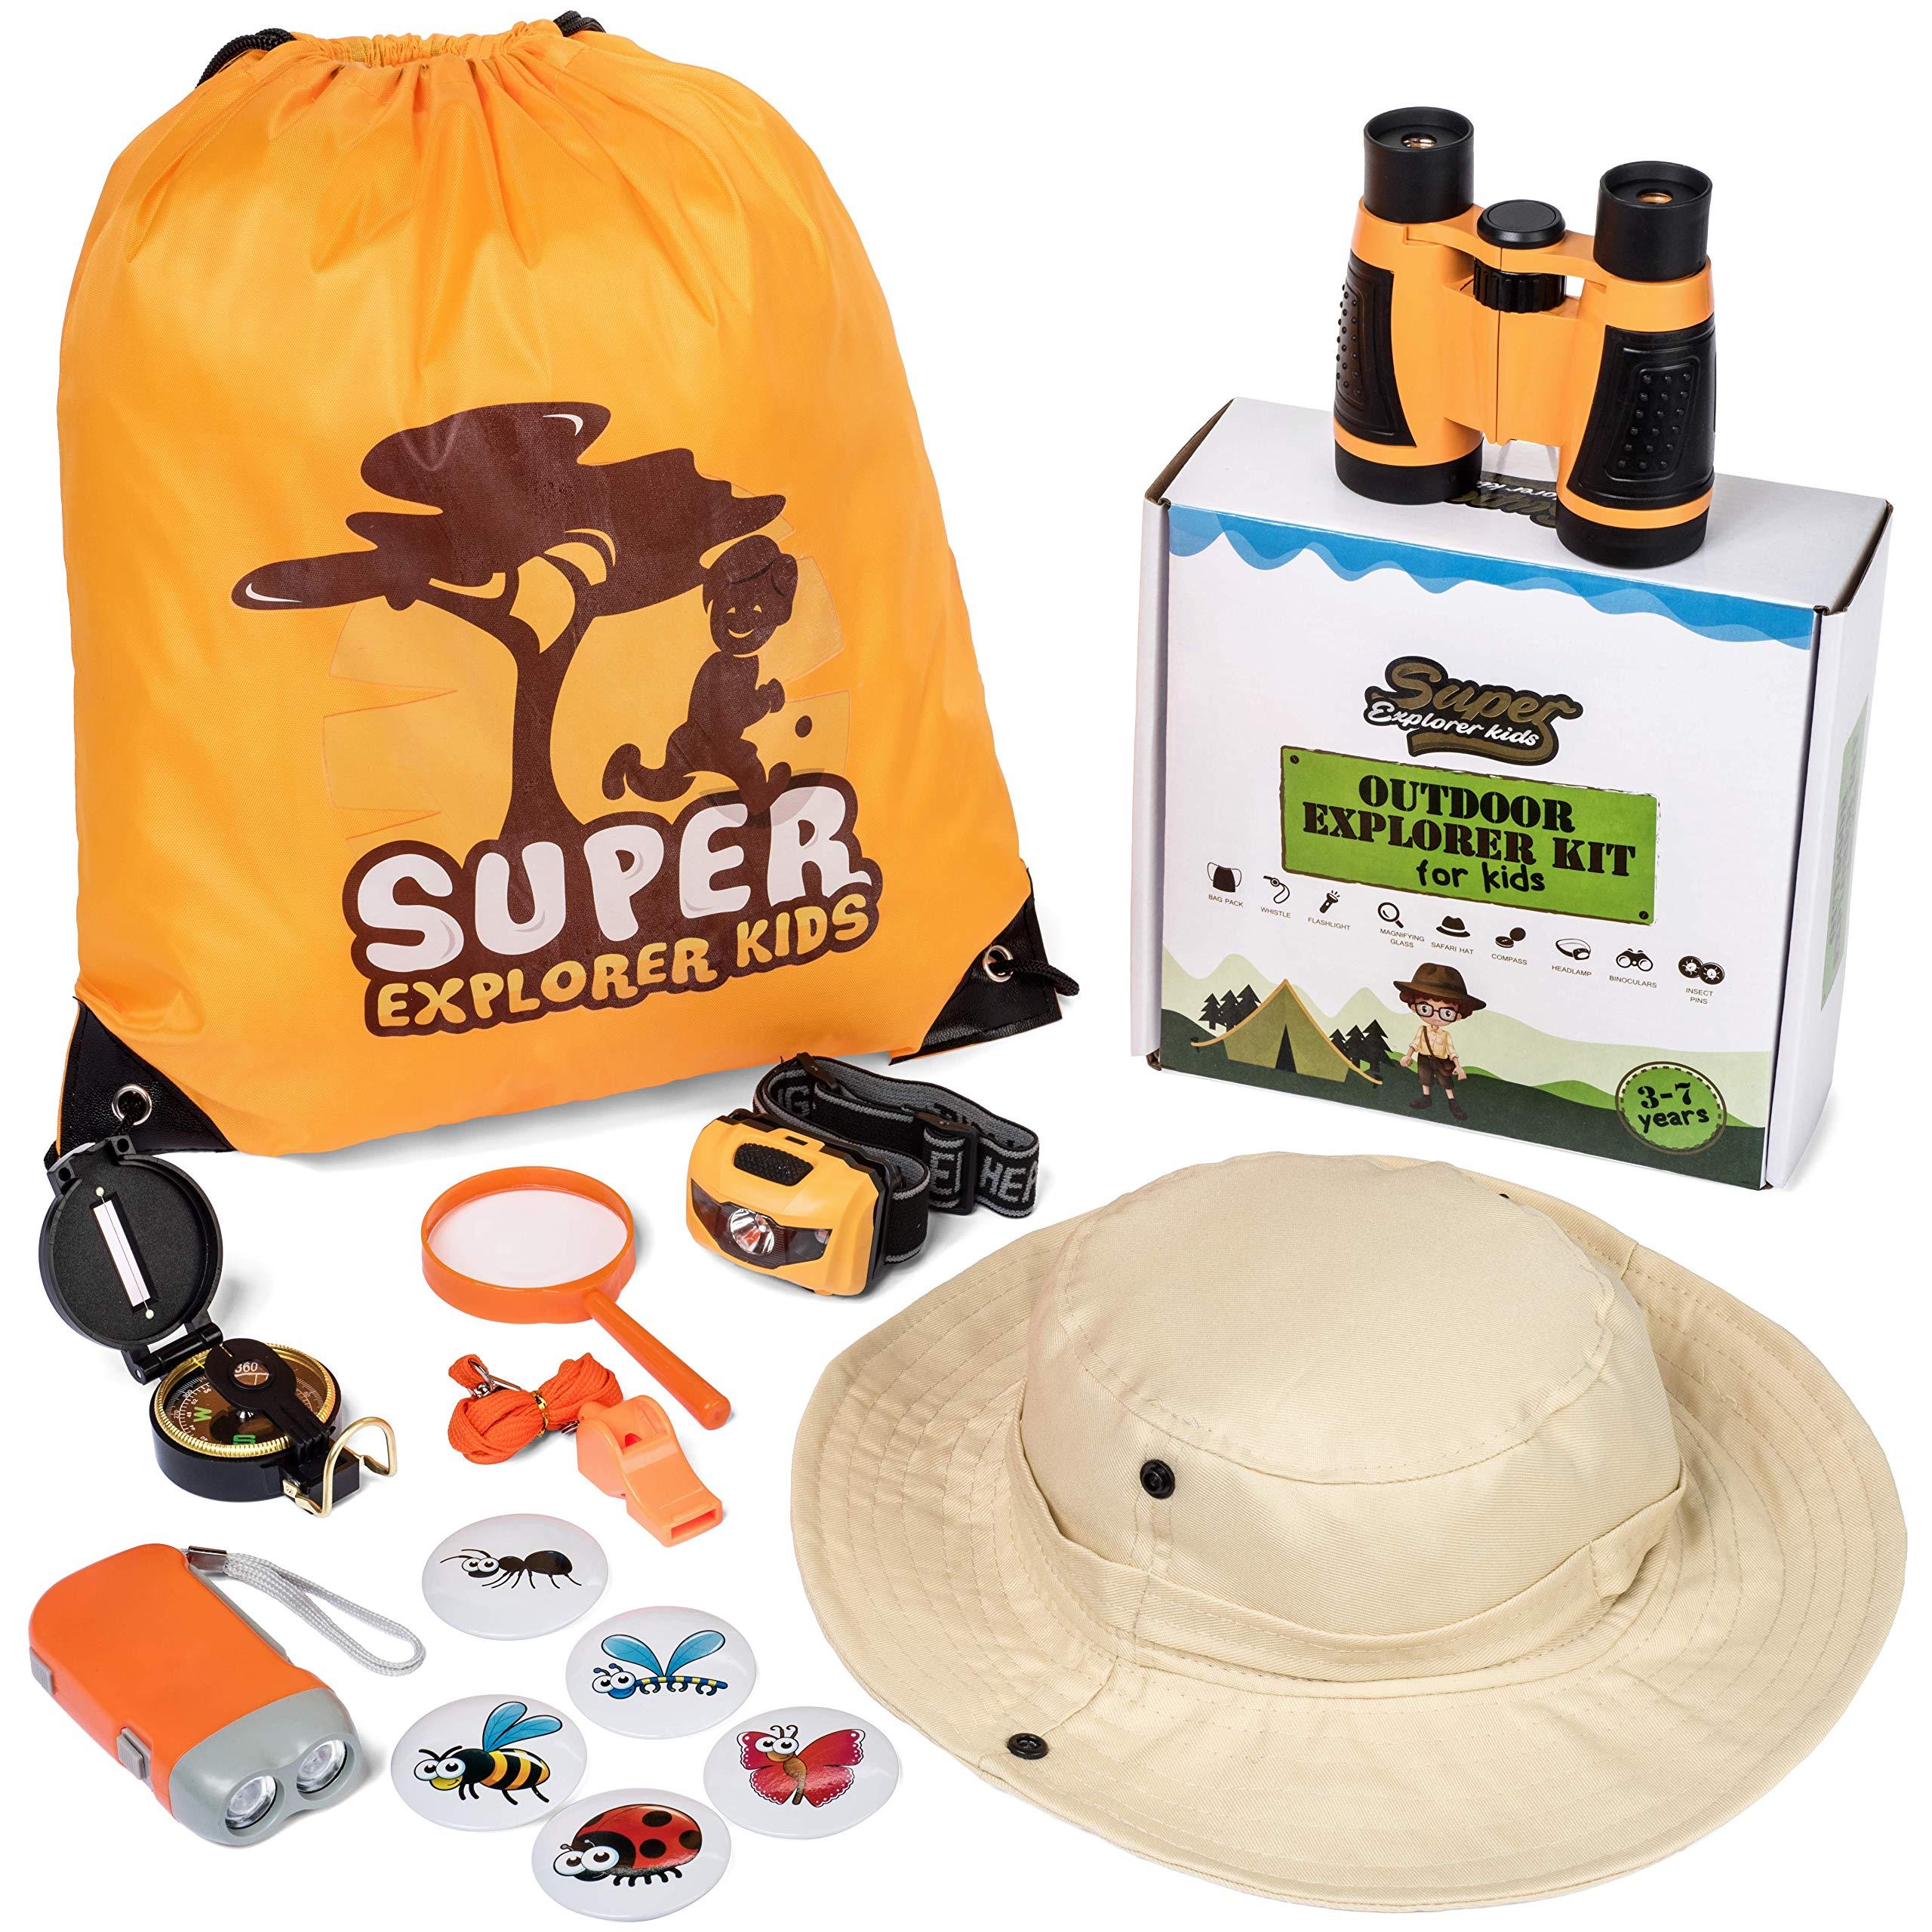 SuperExplorerKids Outdoor Explorer Kit by SuperExplorerKids